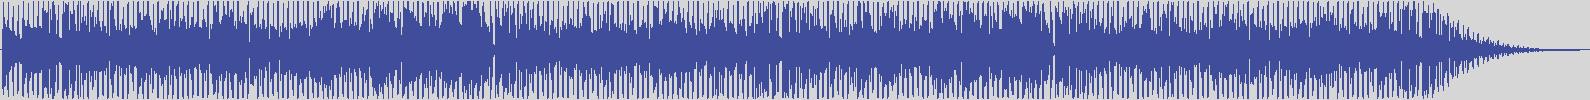 smilax_dig_records [Smilax_X448DIG] Mirko - Ufo Robot [Original Mix] audio wave form